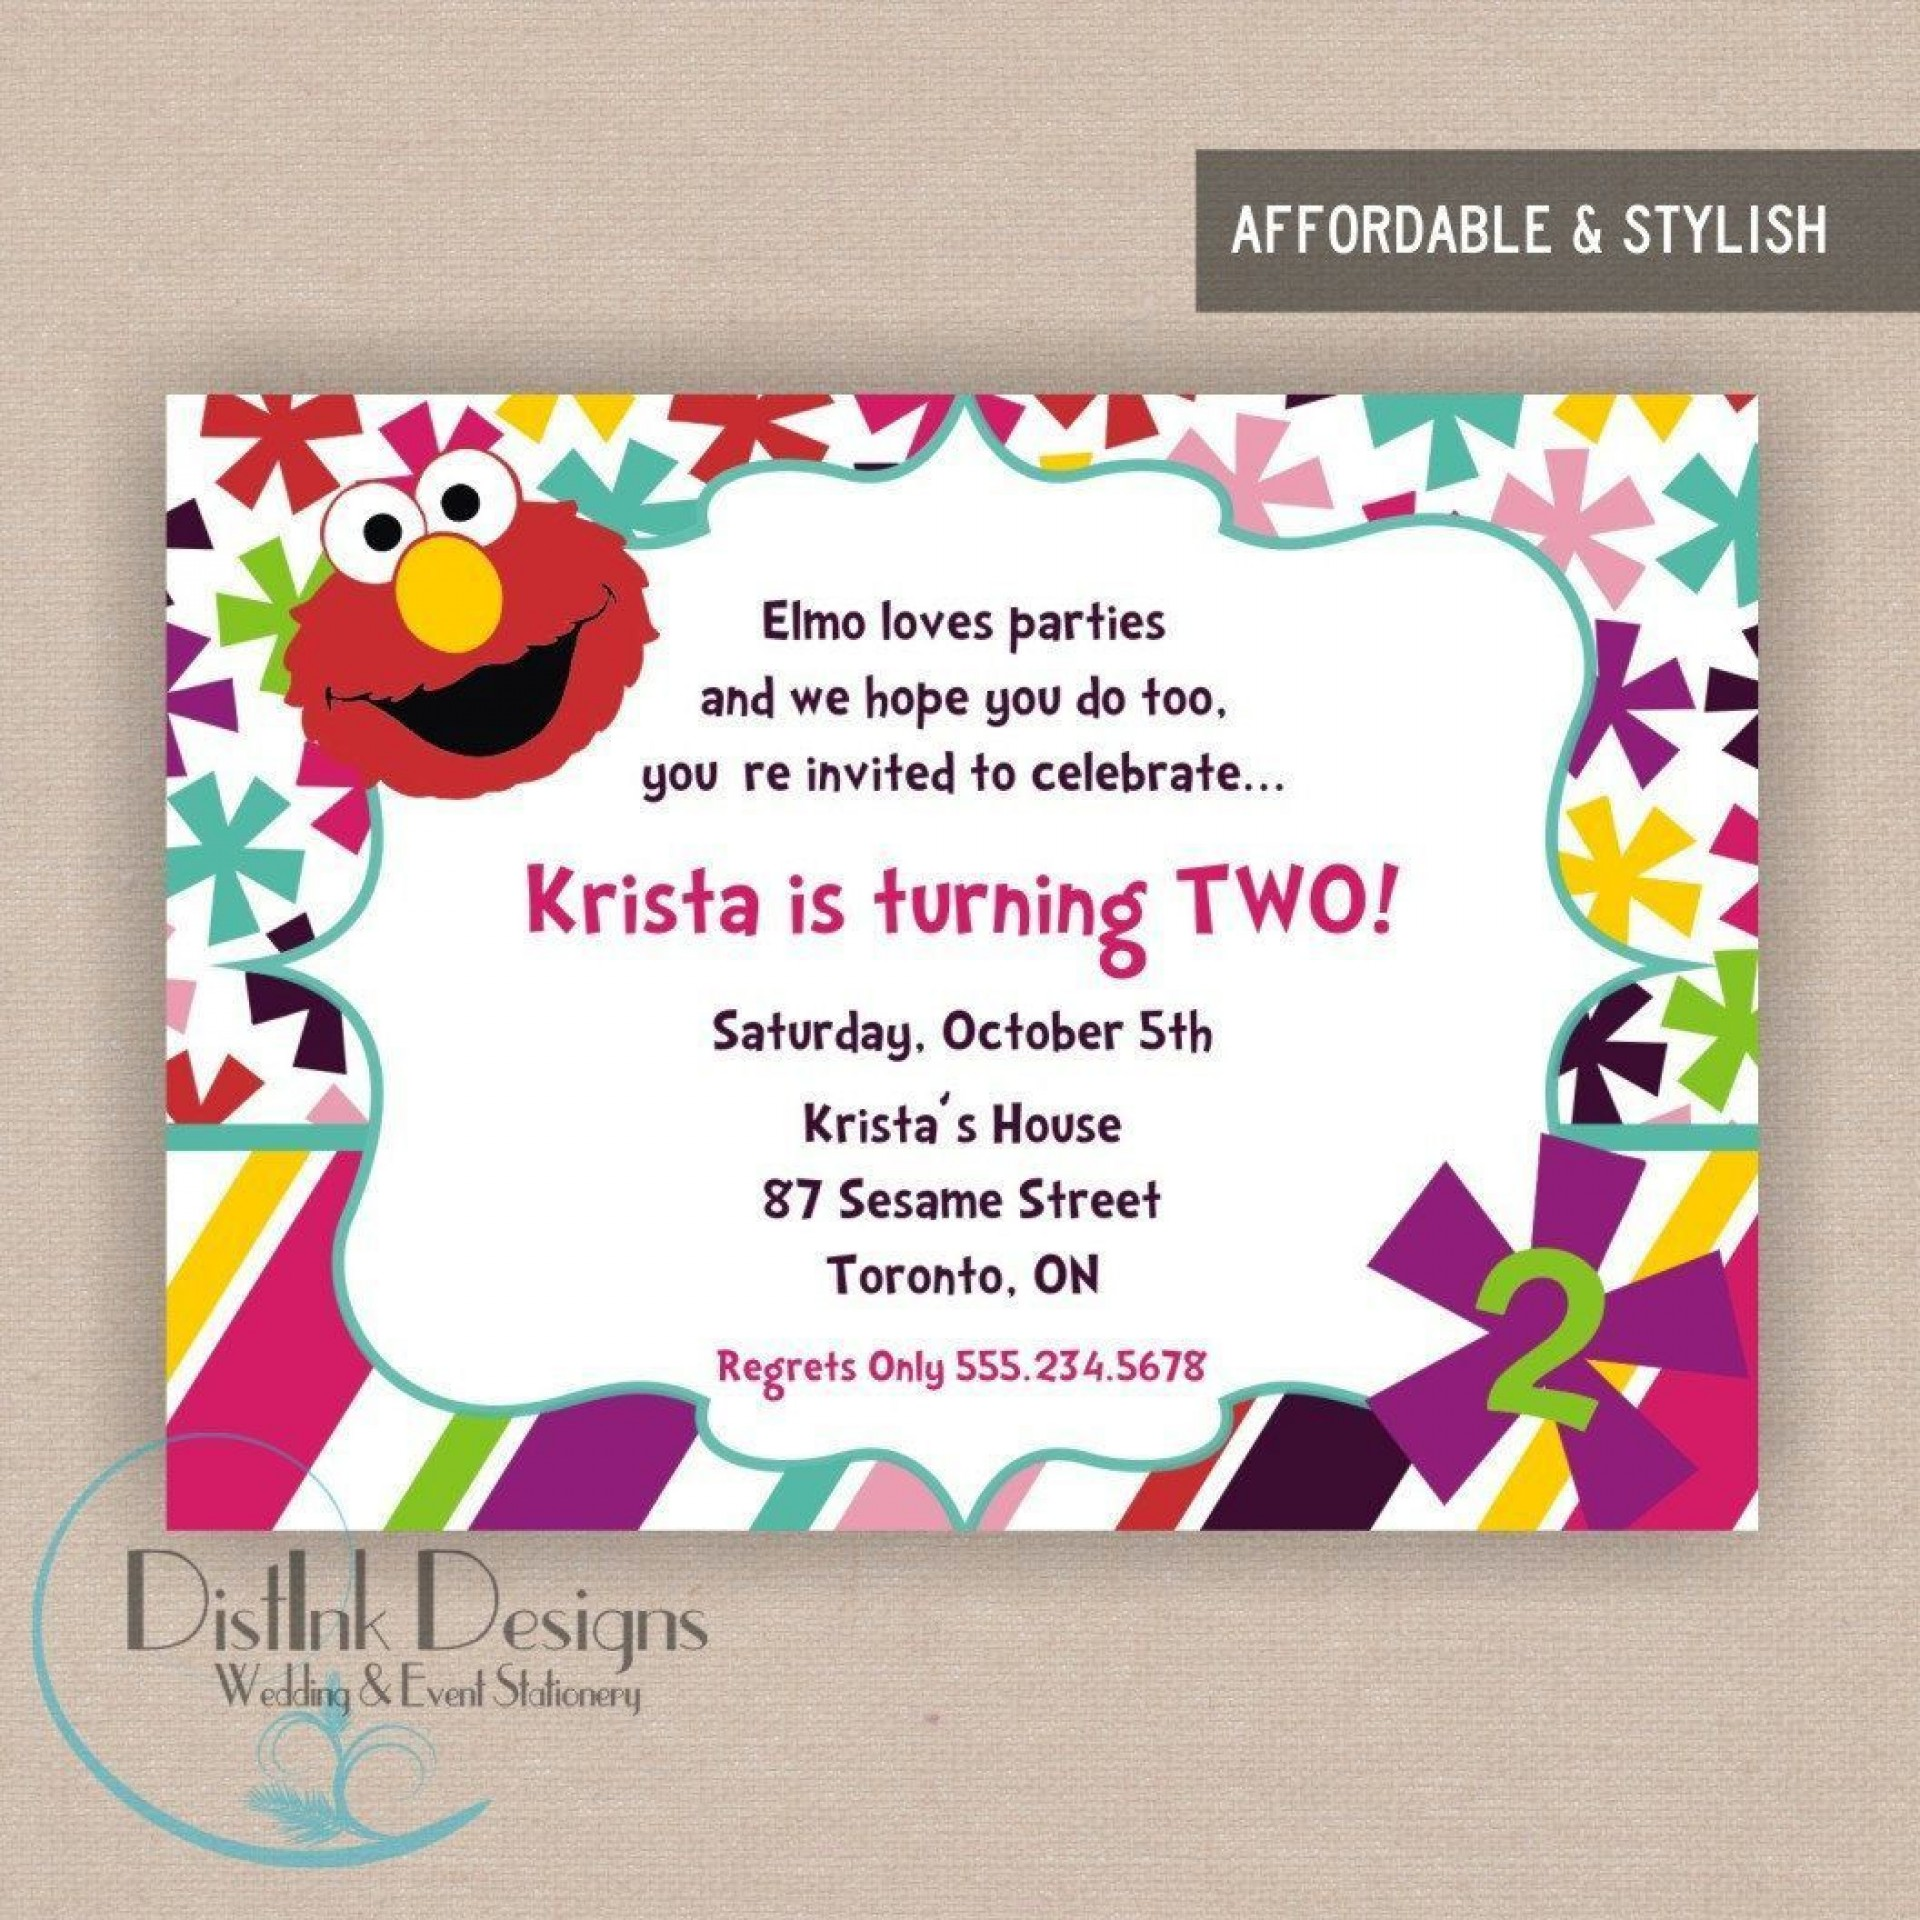 000 Striking Birthday Invitation Wording Example High Def  Examples Party Invite Brunch Idea1920